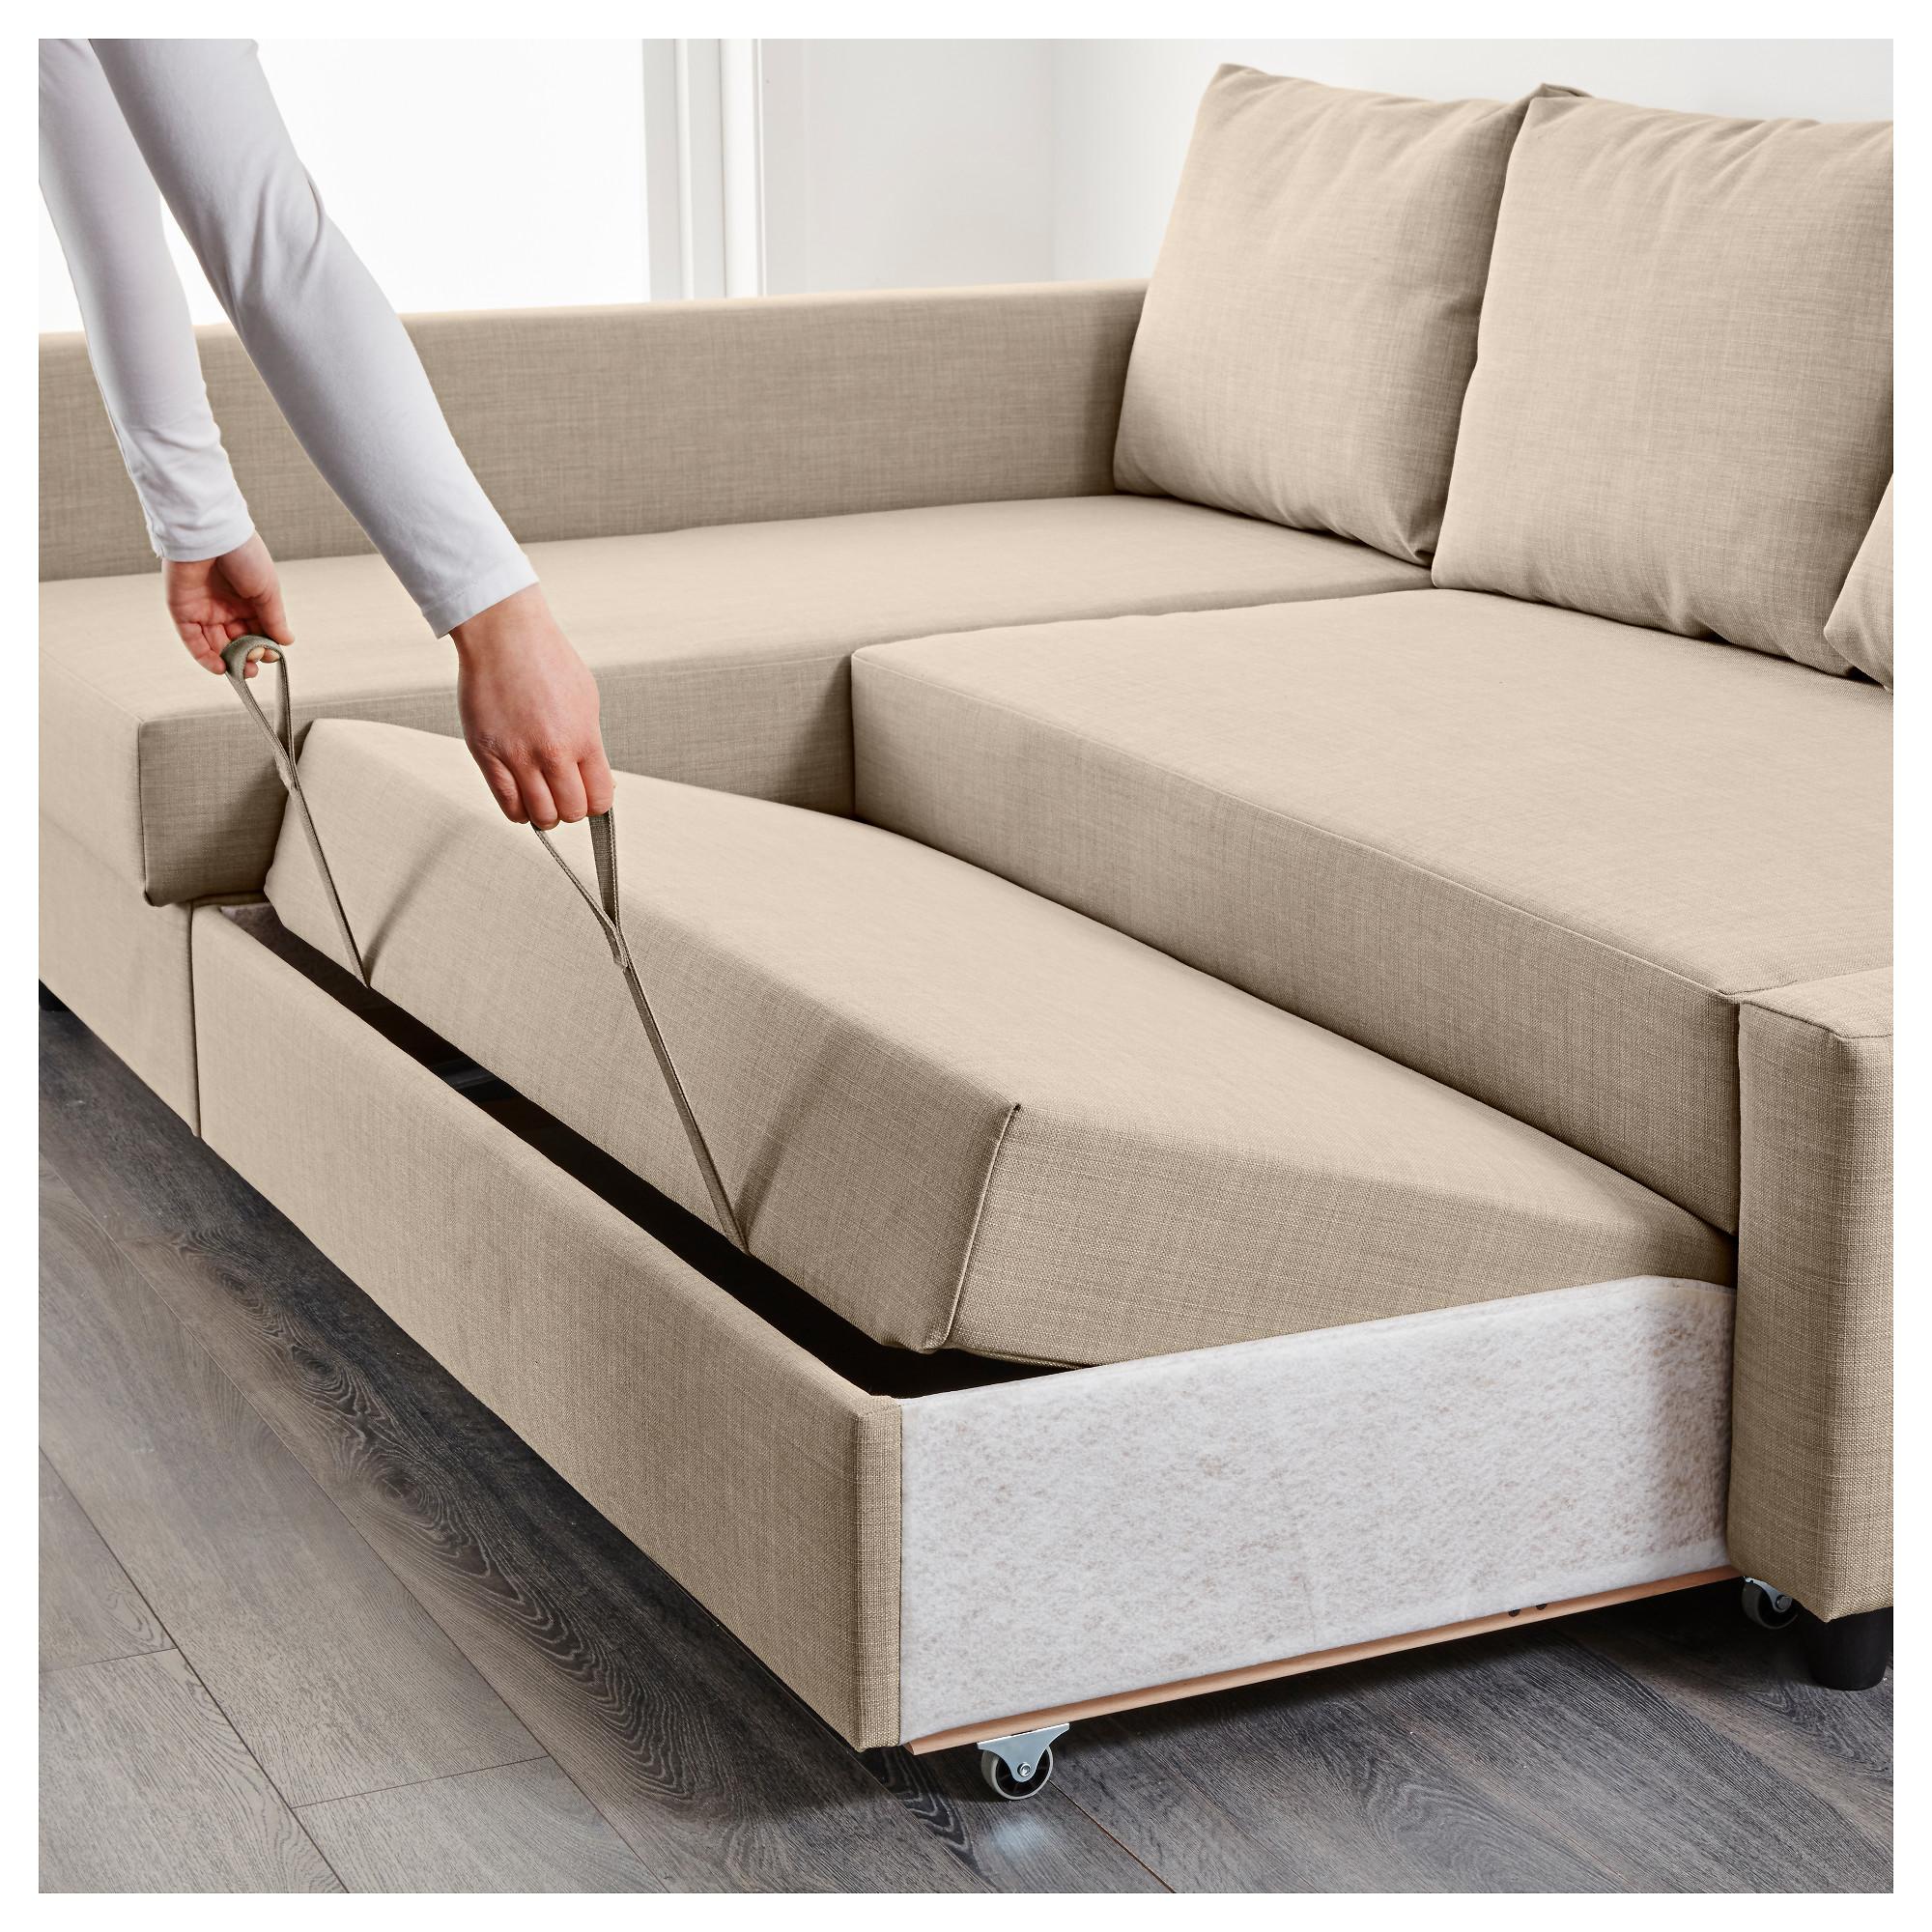 sofabed friheten corner sofa-bed with storage - skiftebo dark grey - ikea WIKBAQH